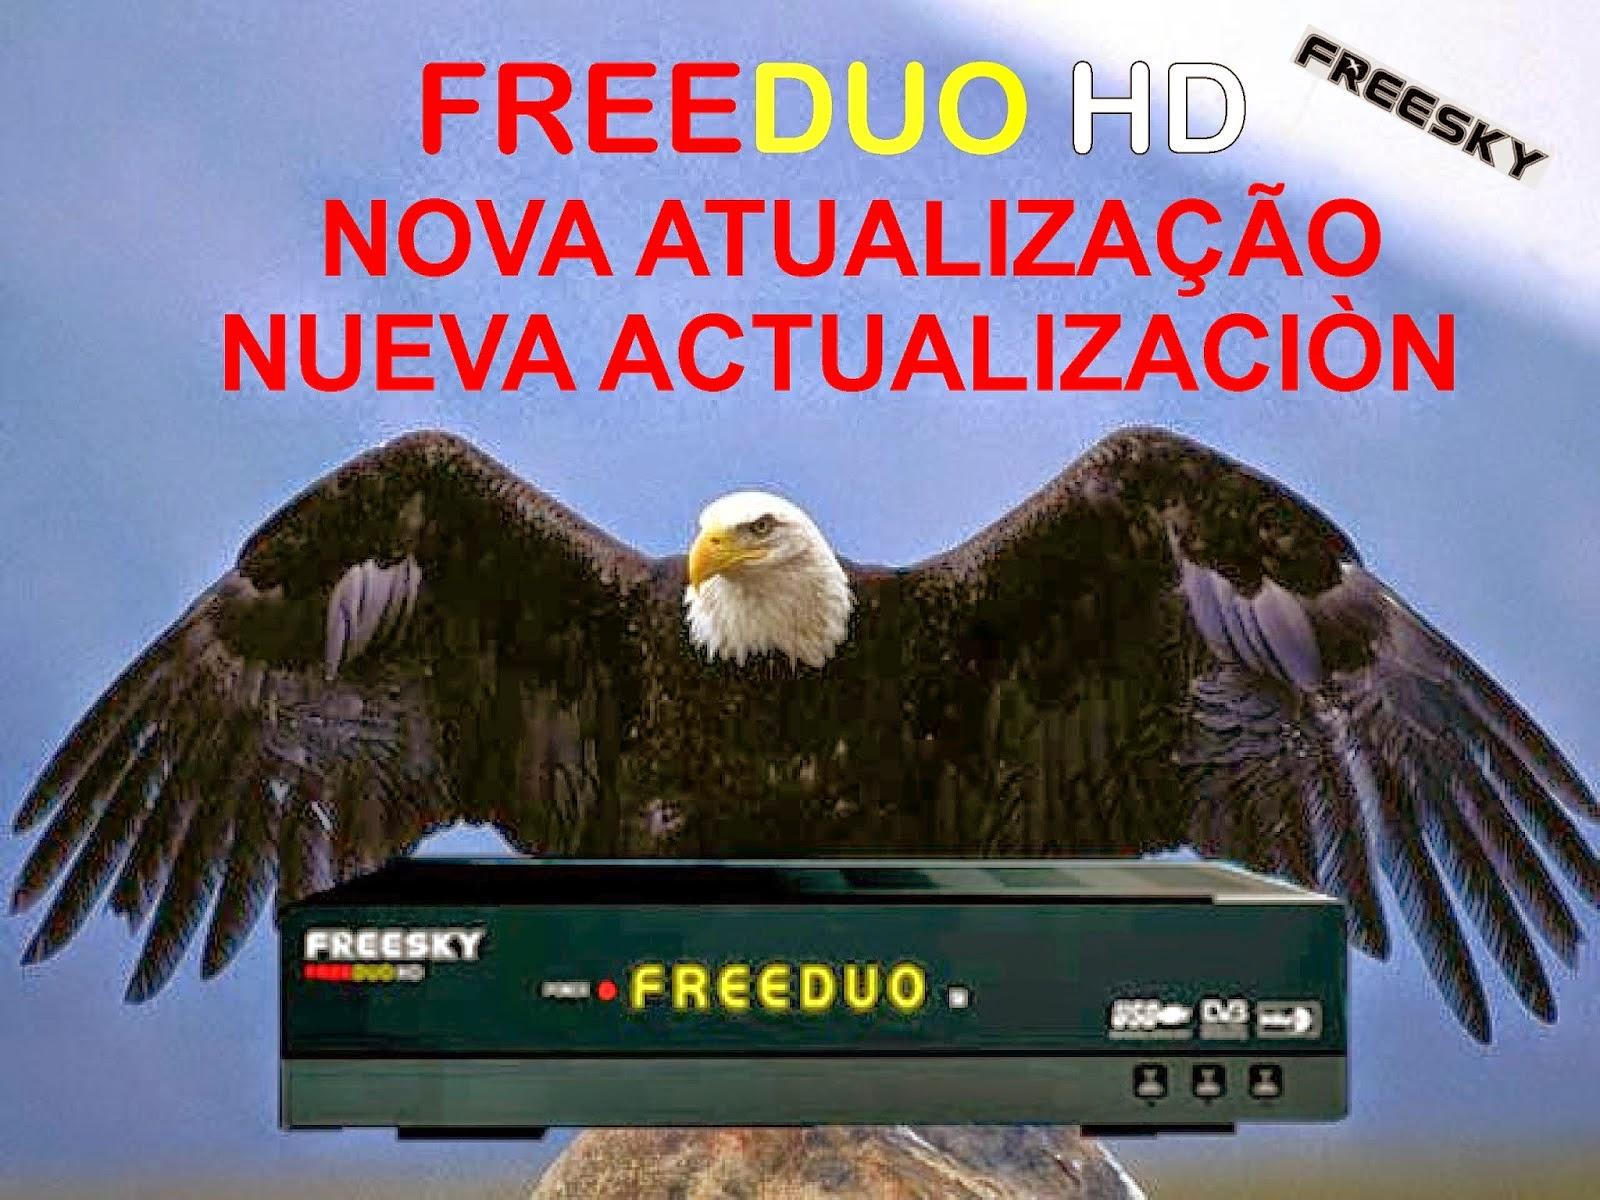 ����� ����� �������freesky 15.04.14 freeduo.jpg